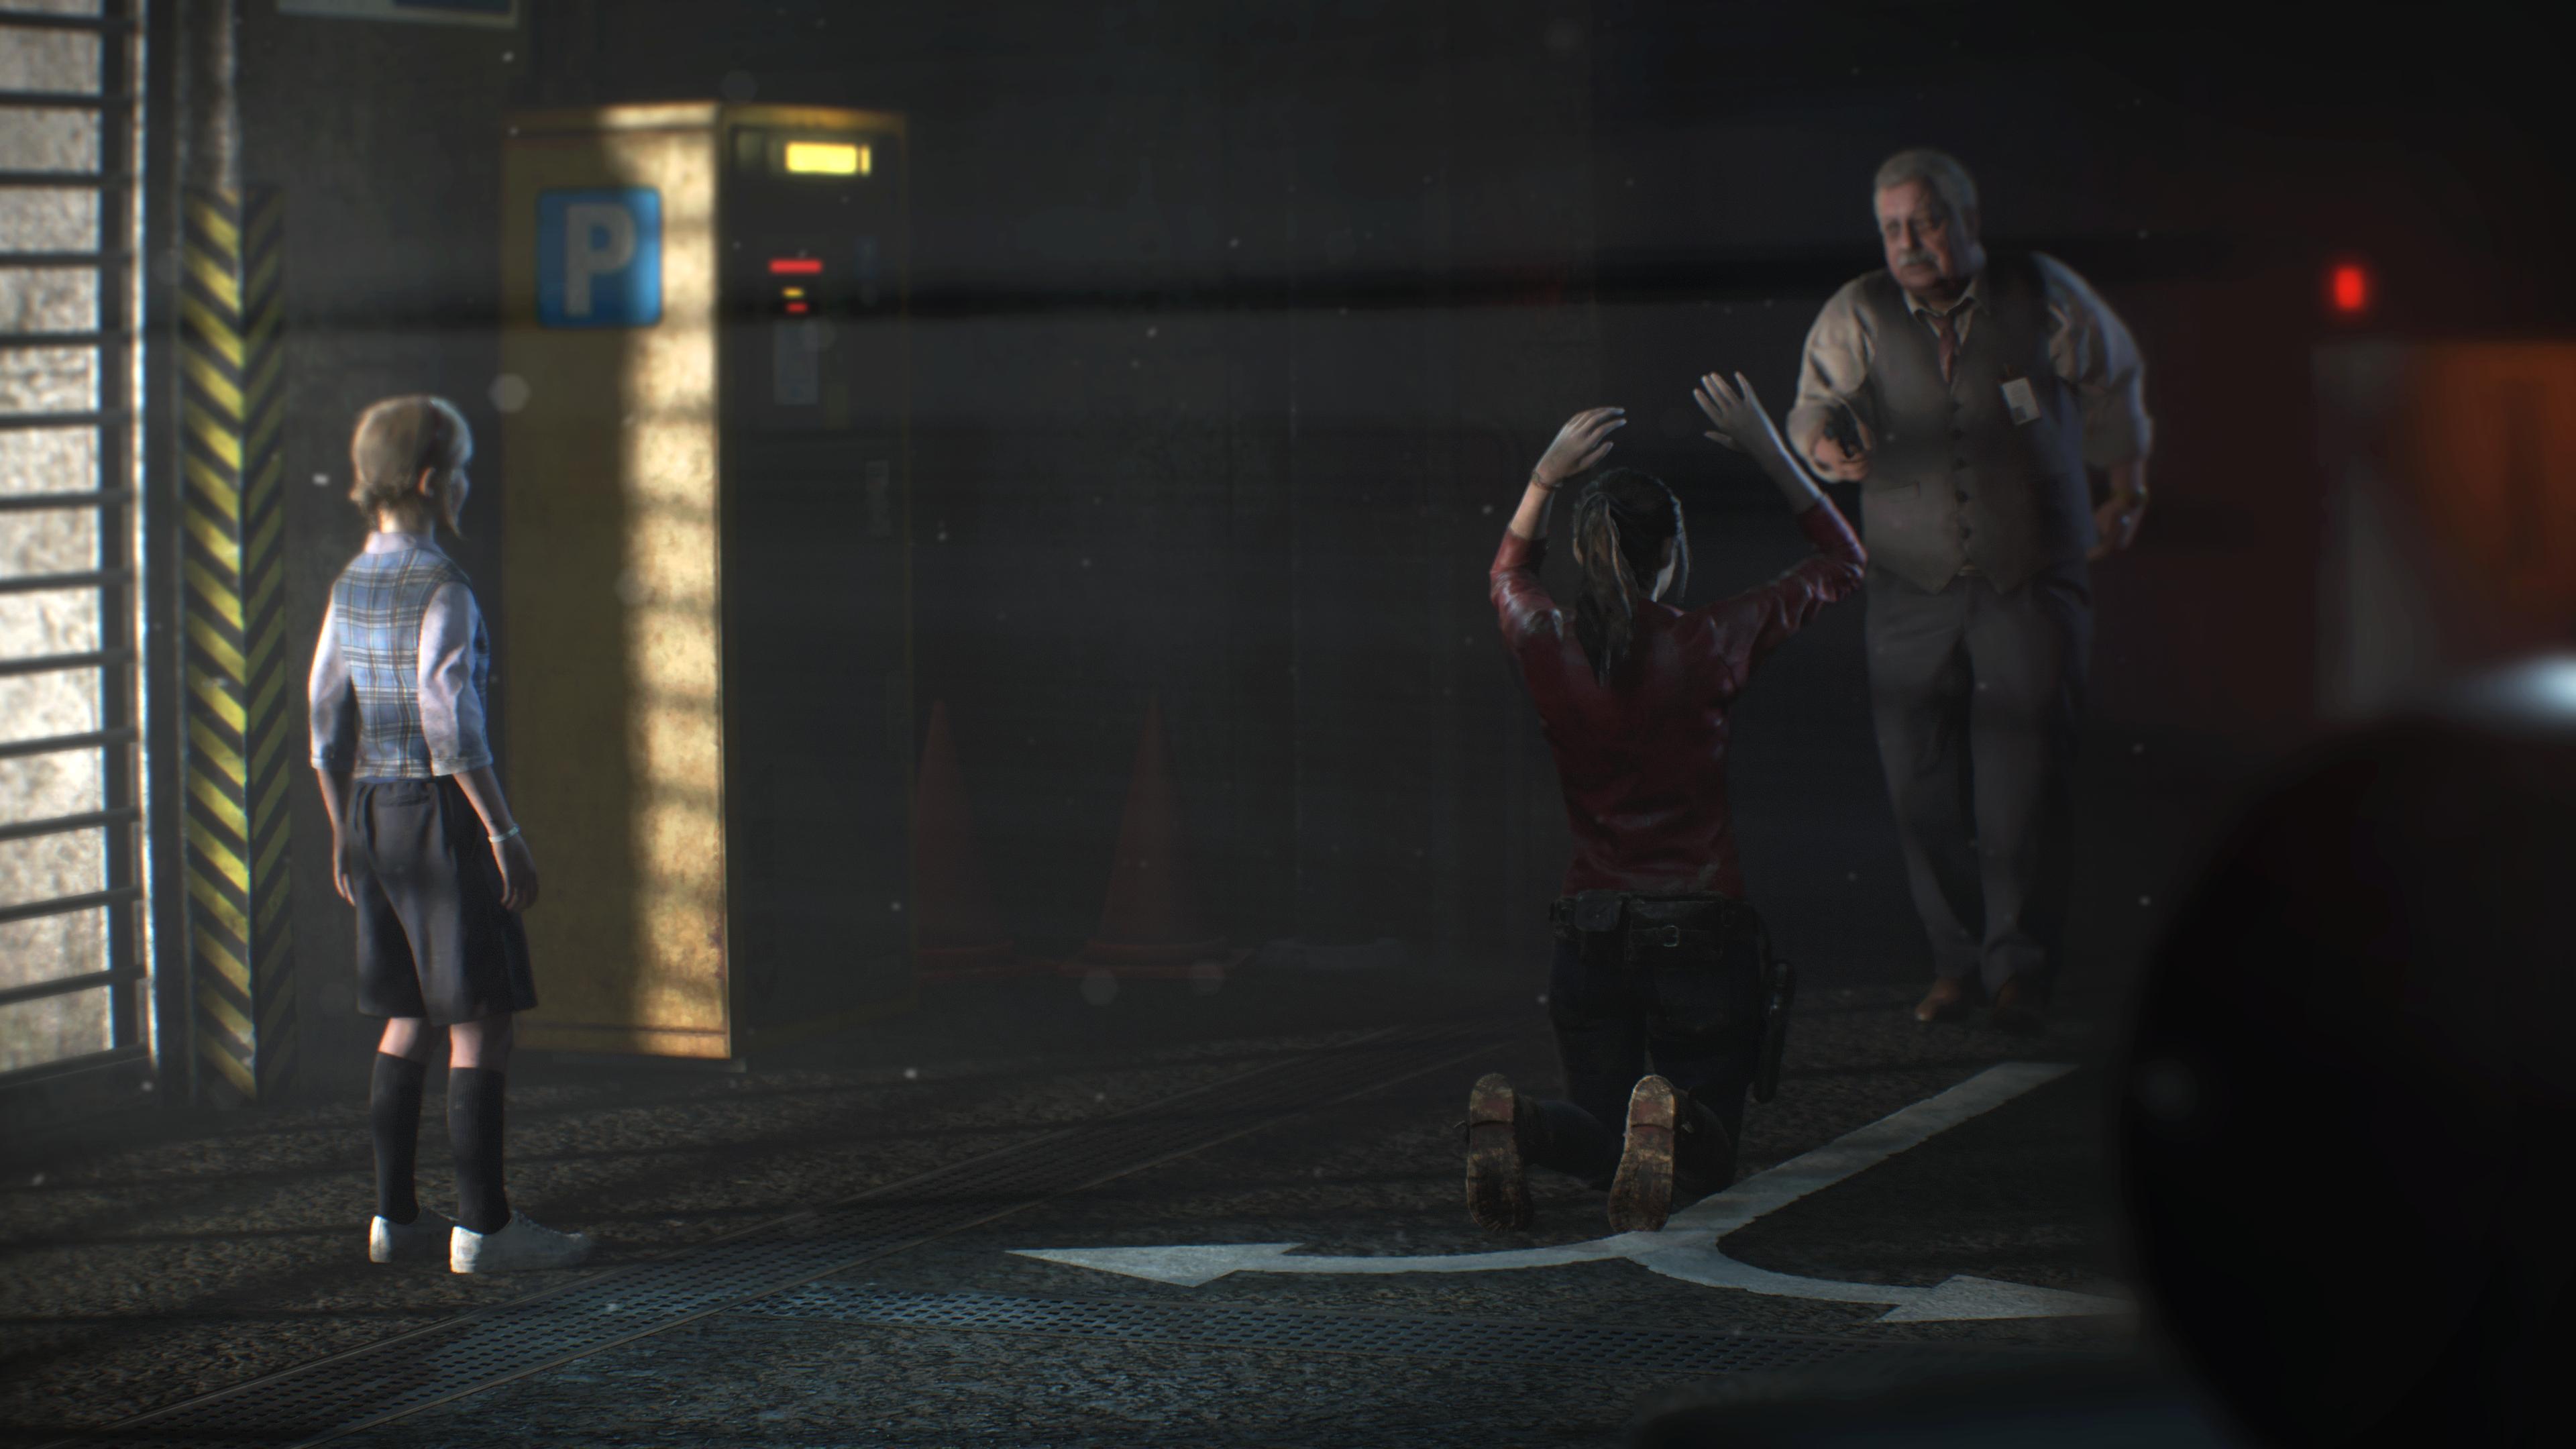 Resident Evil 2 Remake: Claire Redfield protagoniza nuevas imágenes